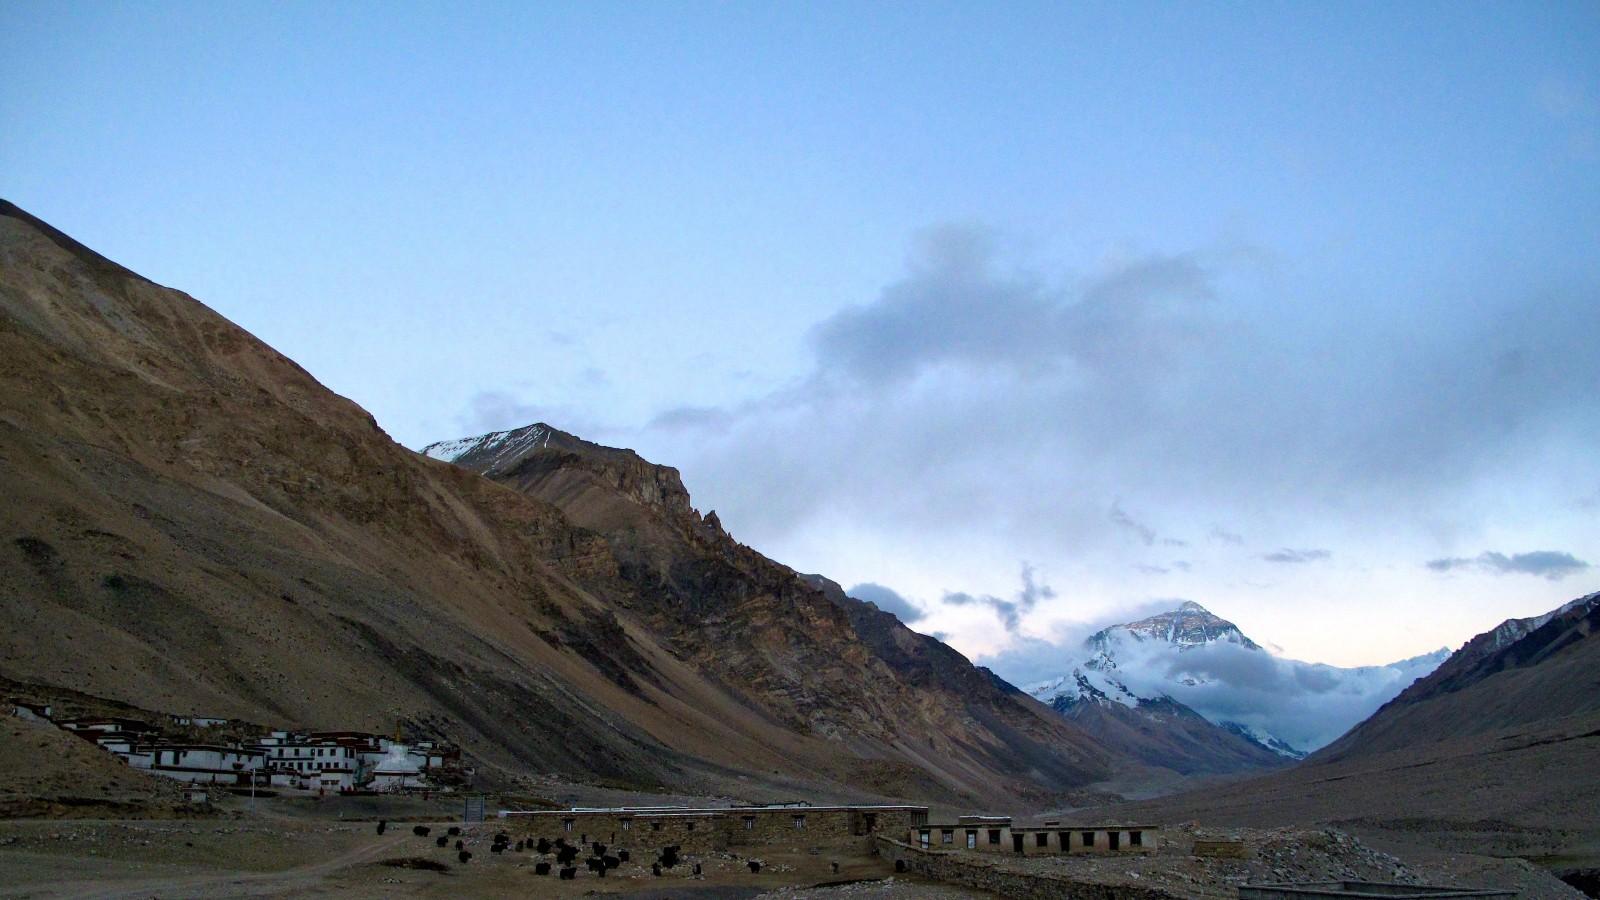 Sunset on Mt. Everest & Rombuk Monastery. Credit: Peter Lippert